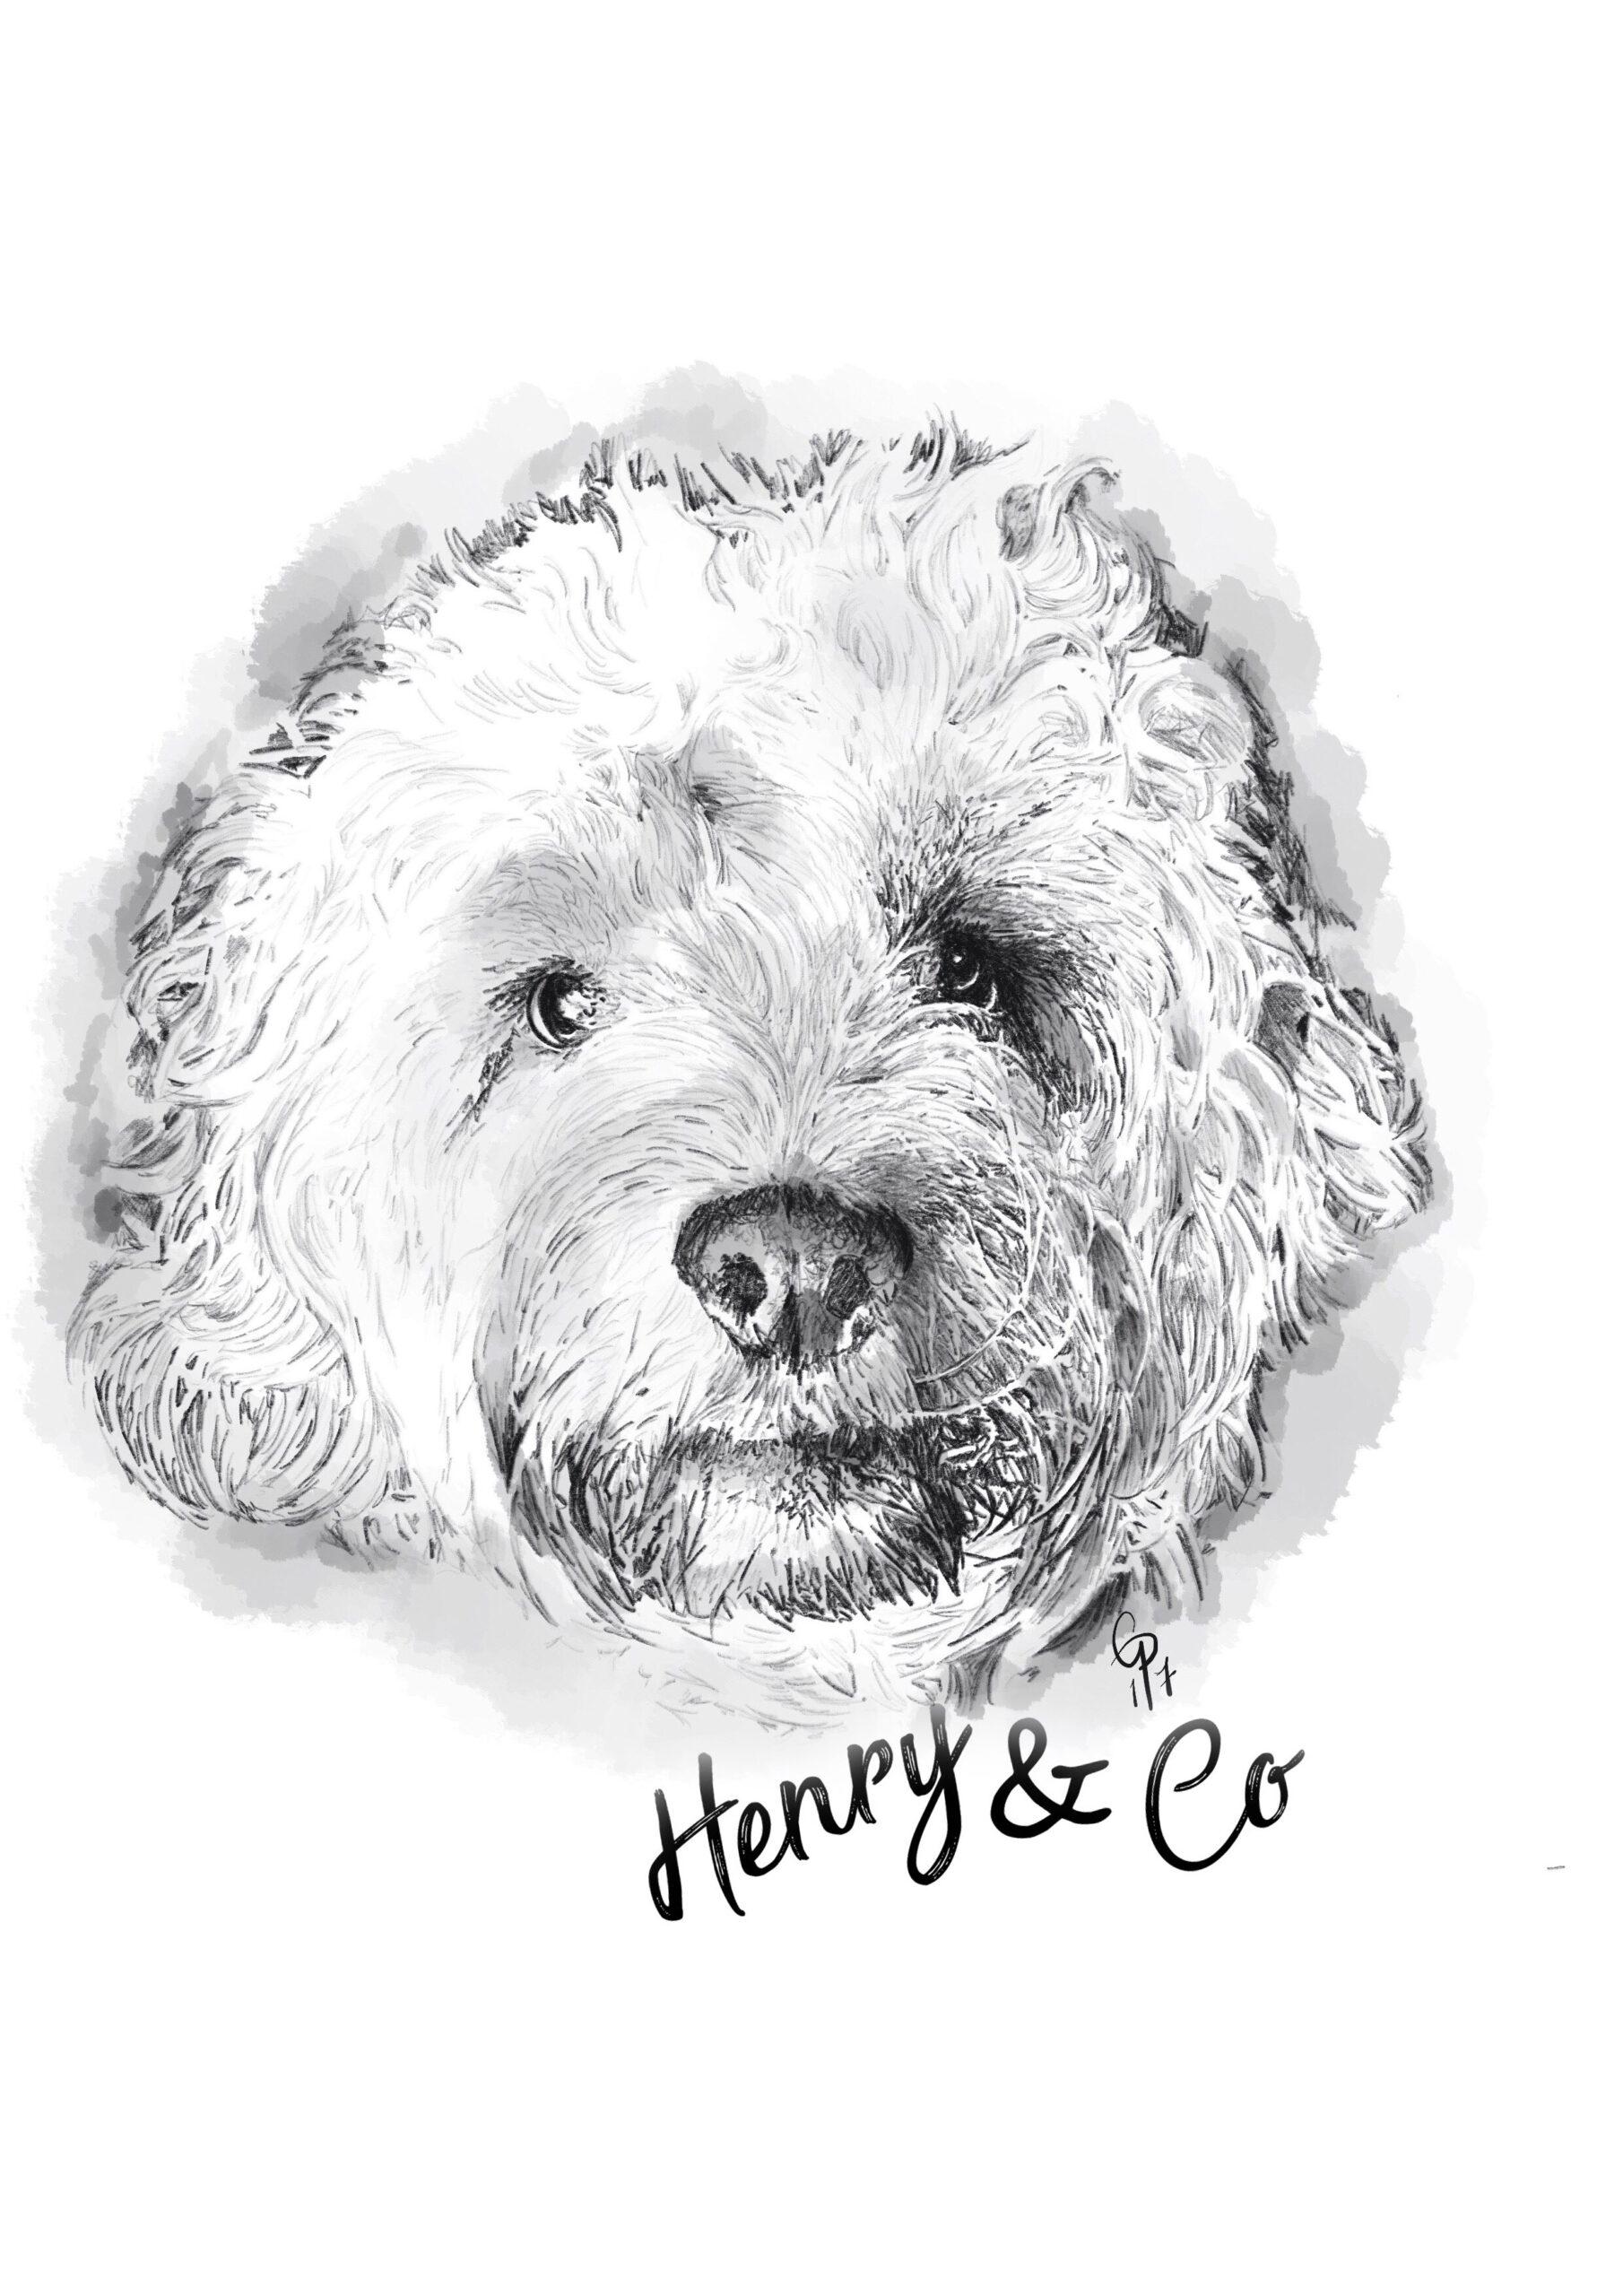 Henry & Co